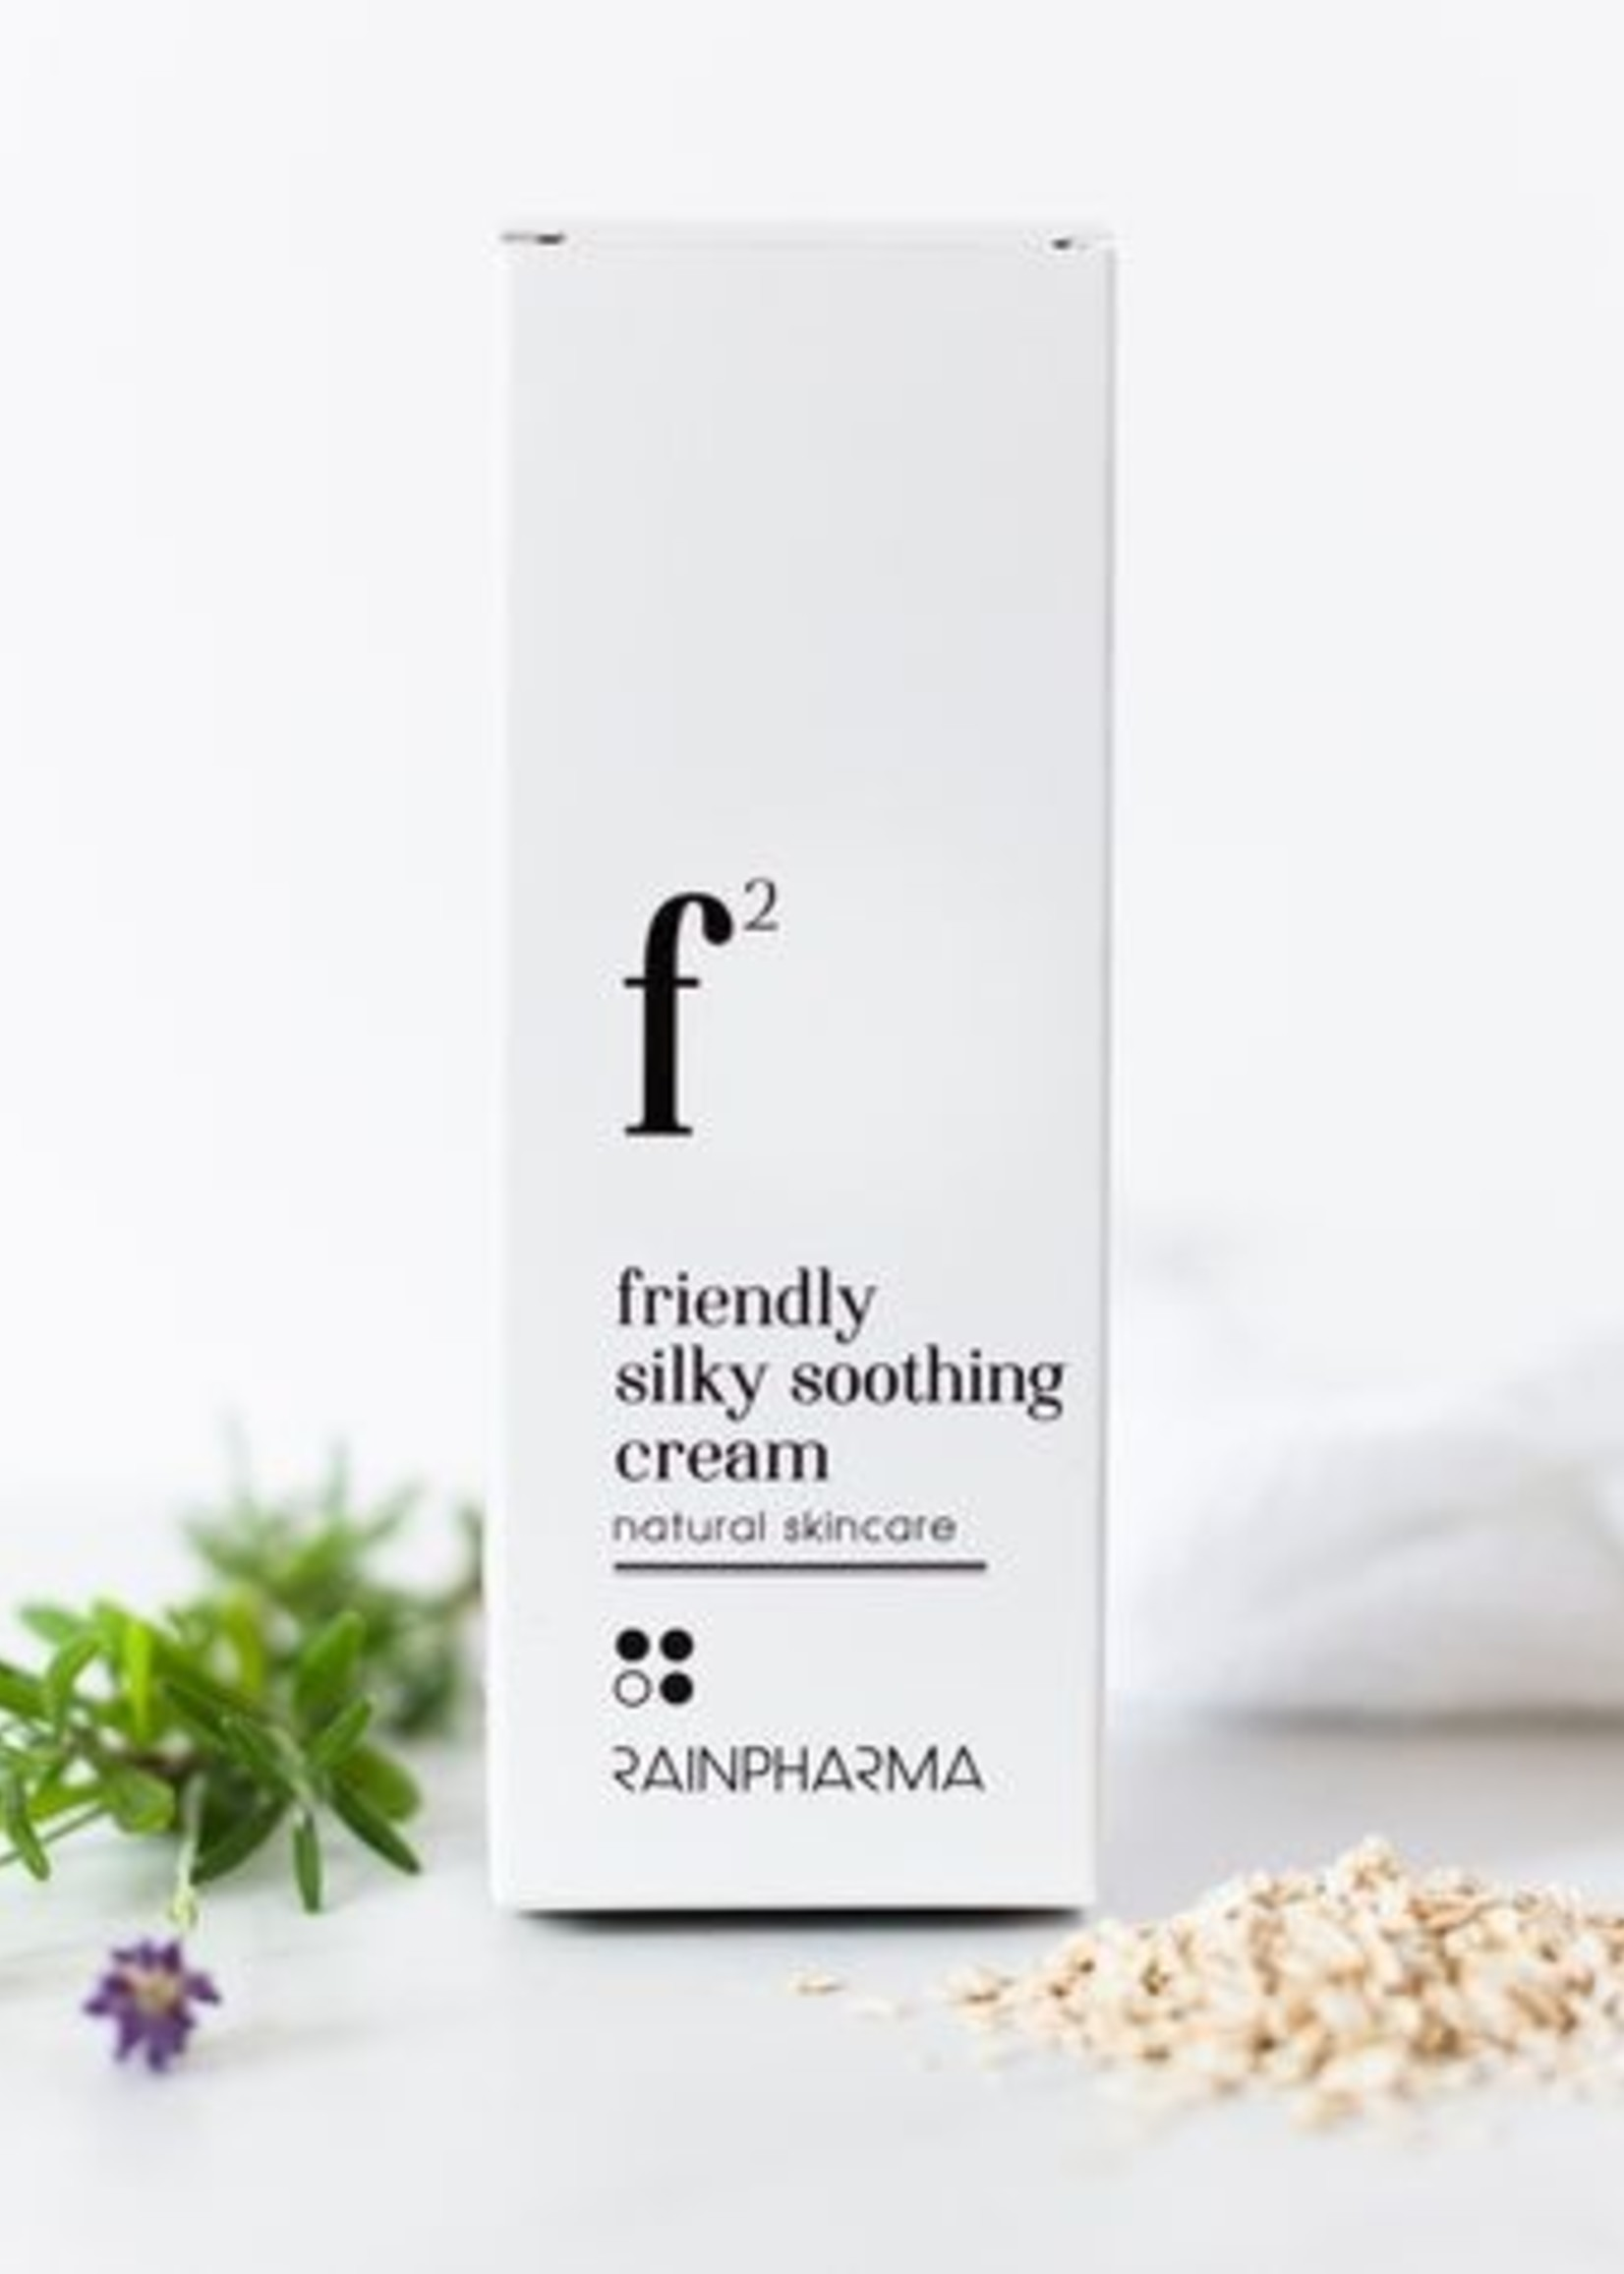 Rainpharma F2 - Friendly Silky Soothing Cream 50ml